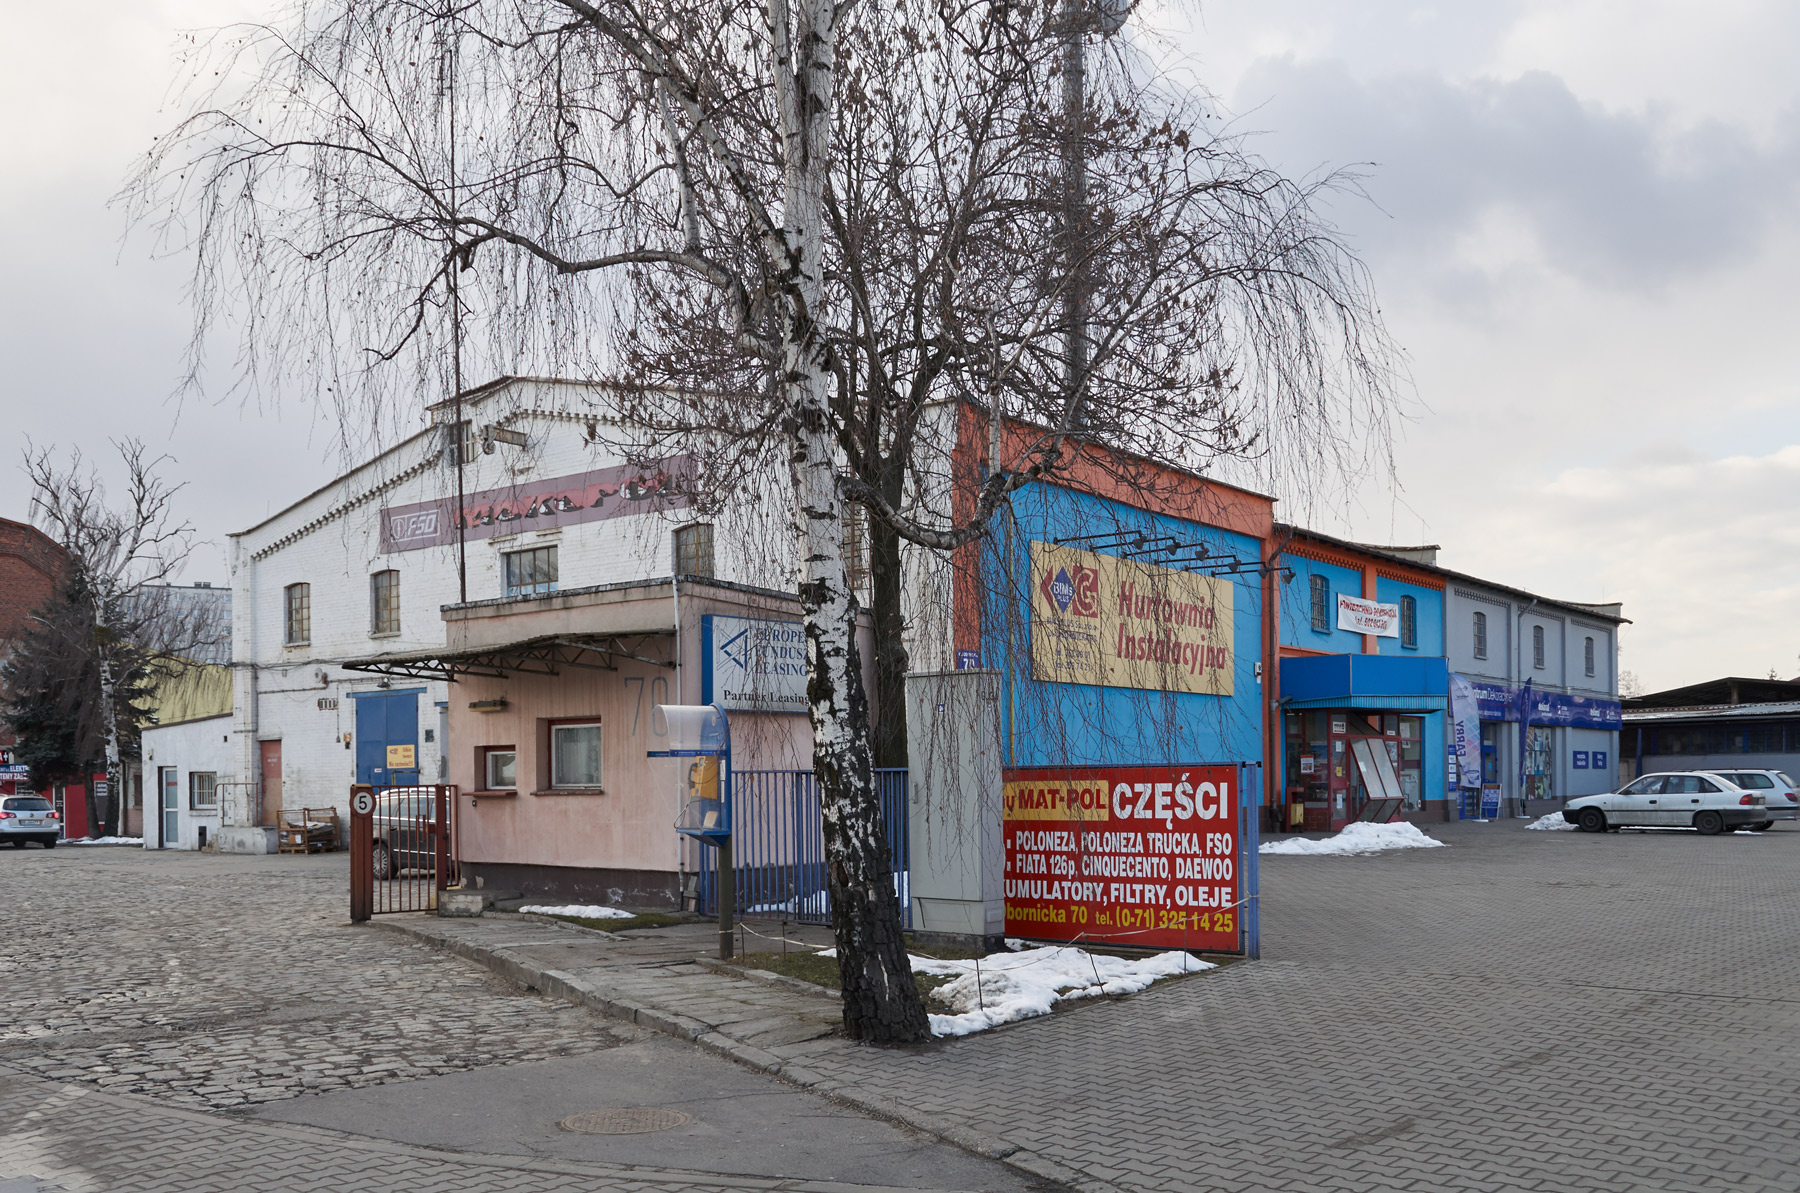 Cukrownia_Rozanka_816542_Fotopolska-Eu